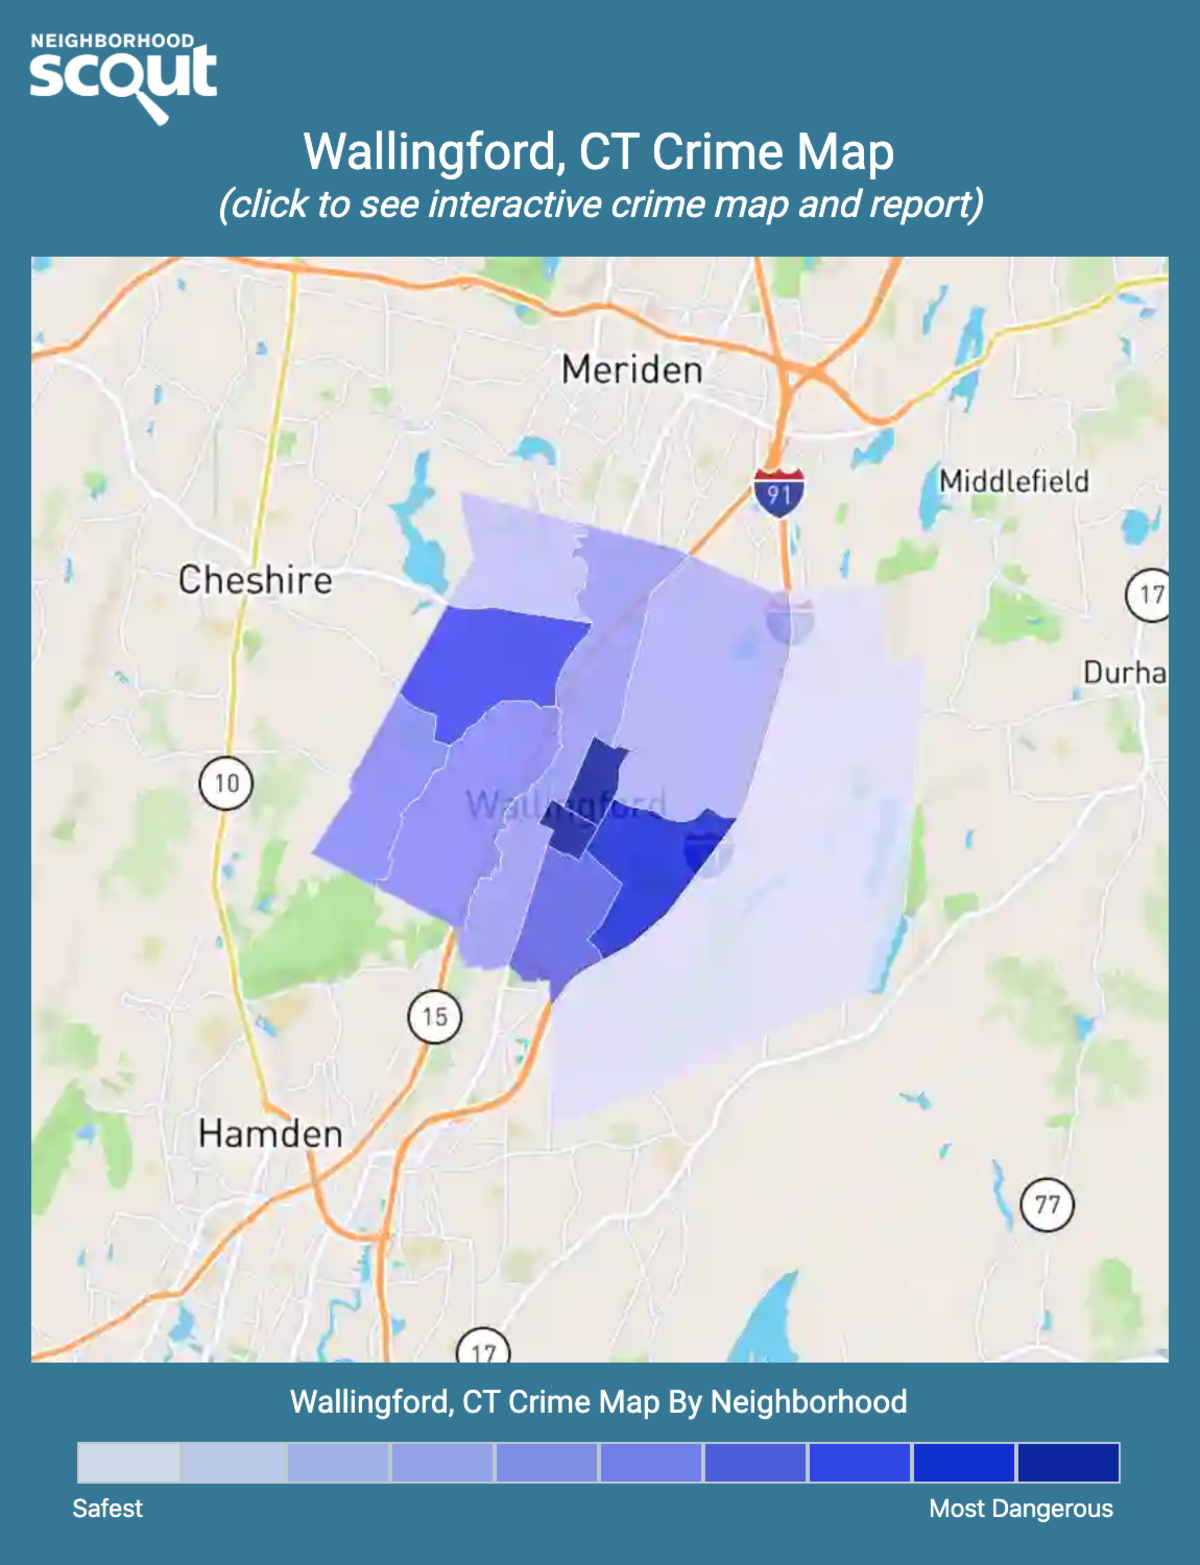 Wallingford, Connecticut crime map